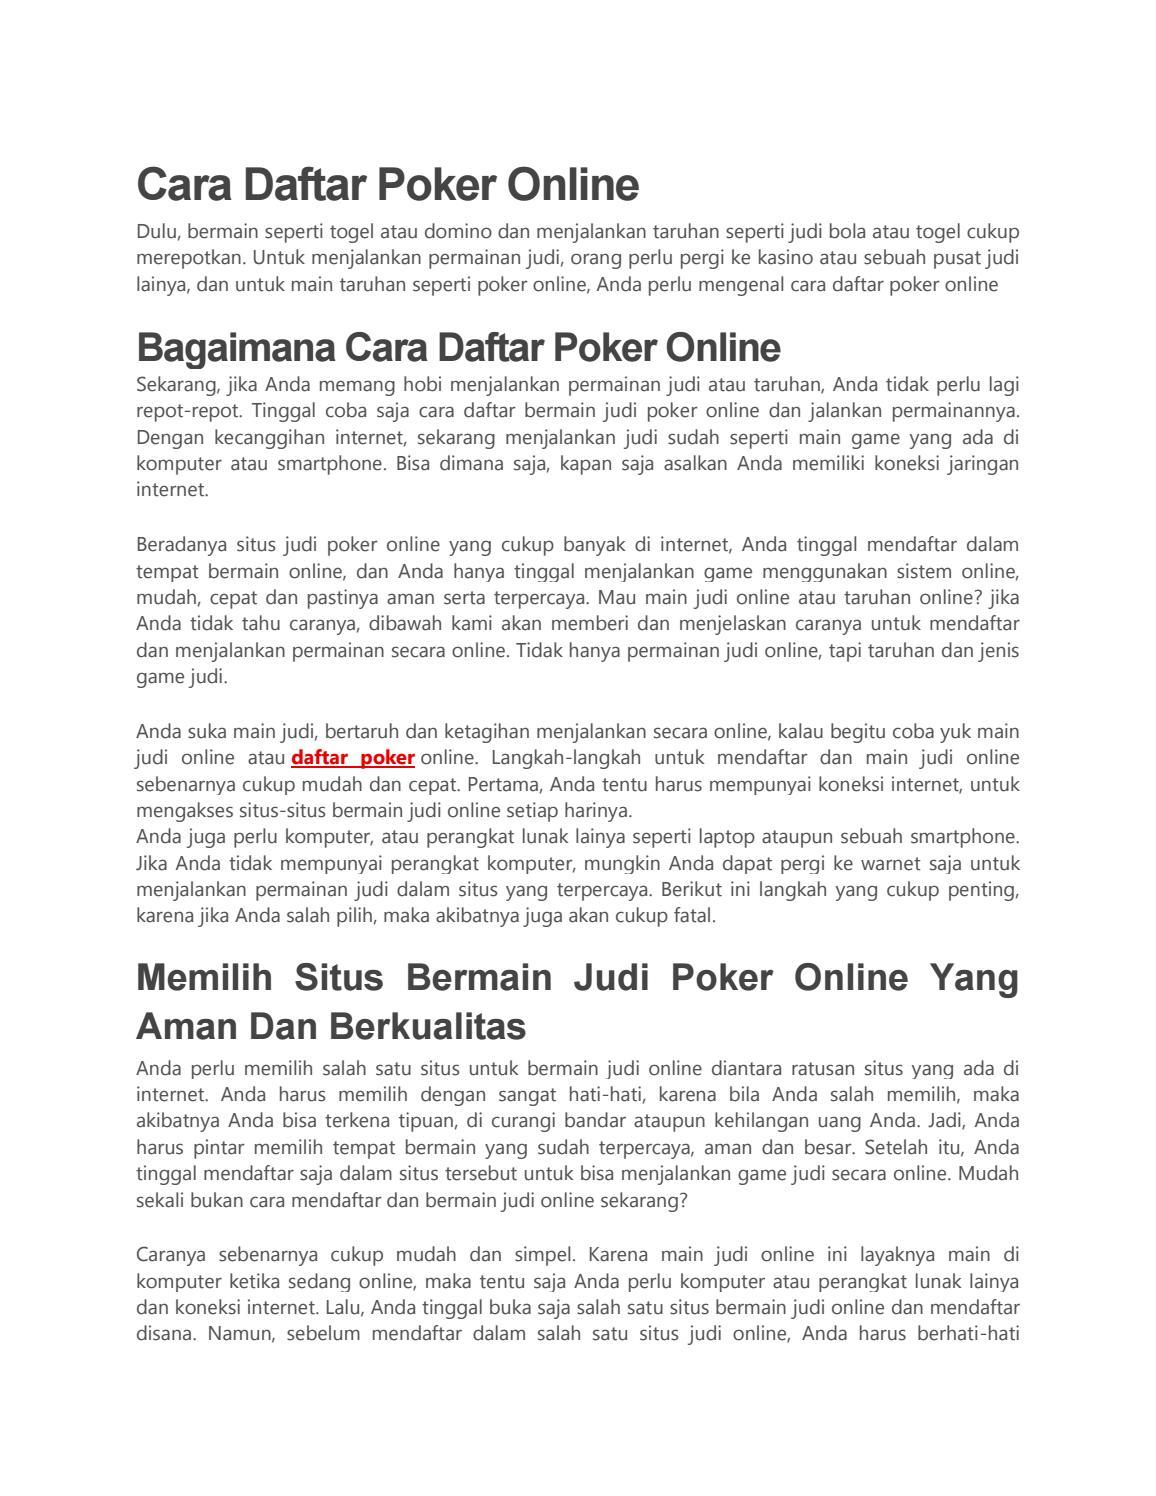 Cara Daftar Poker Online By Caradaftarpkroln Id Issuu